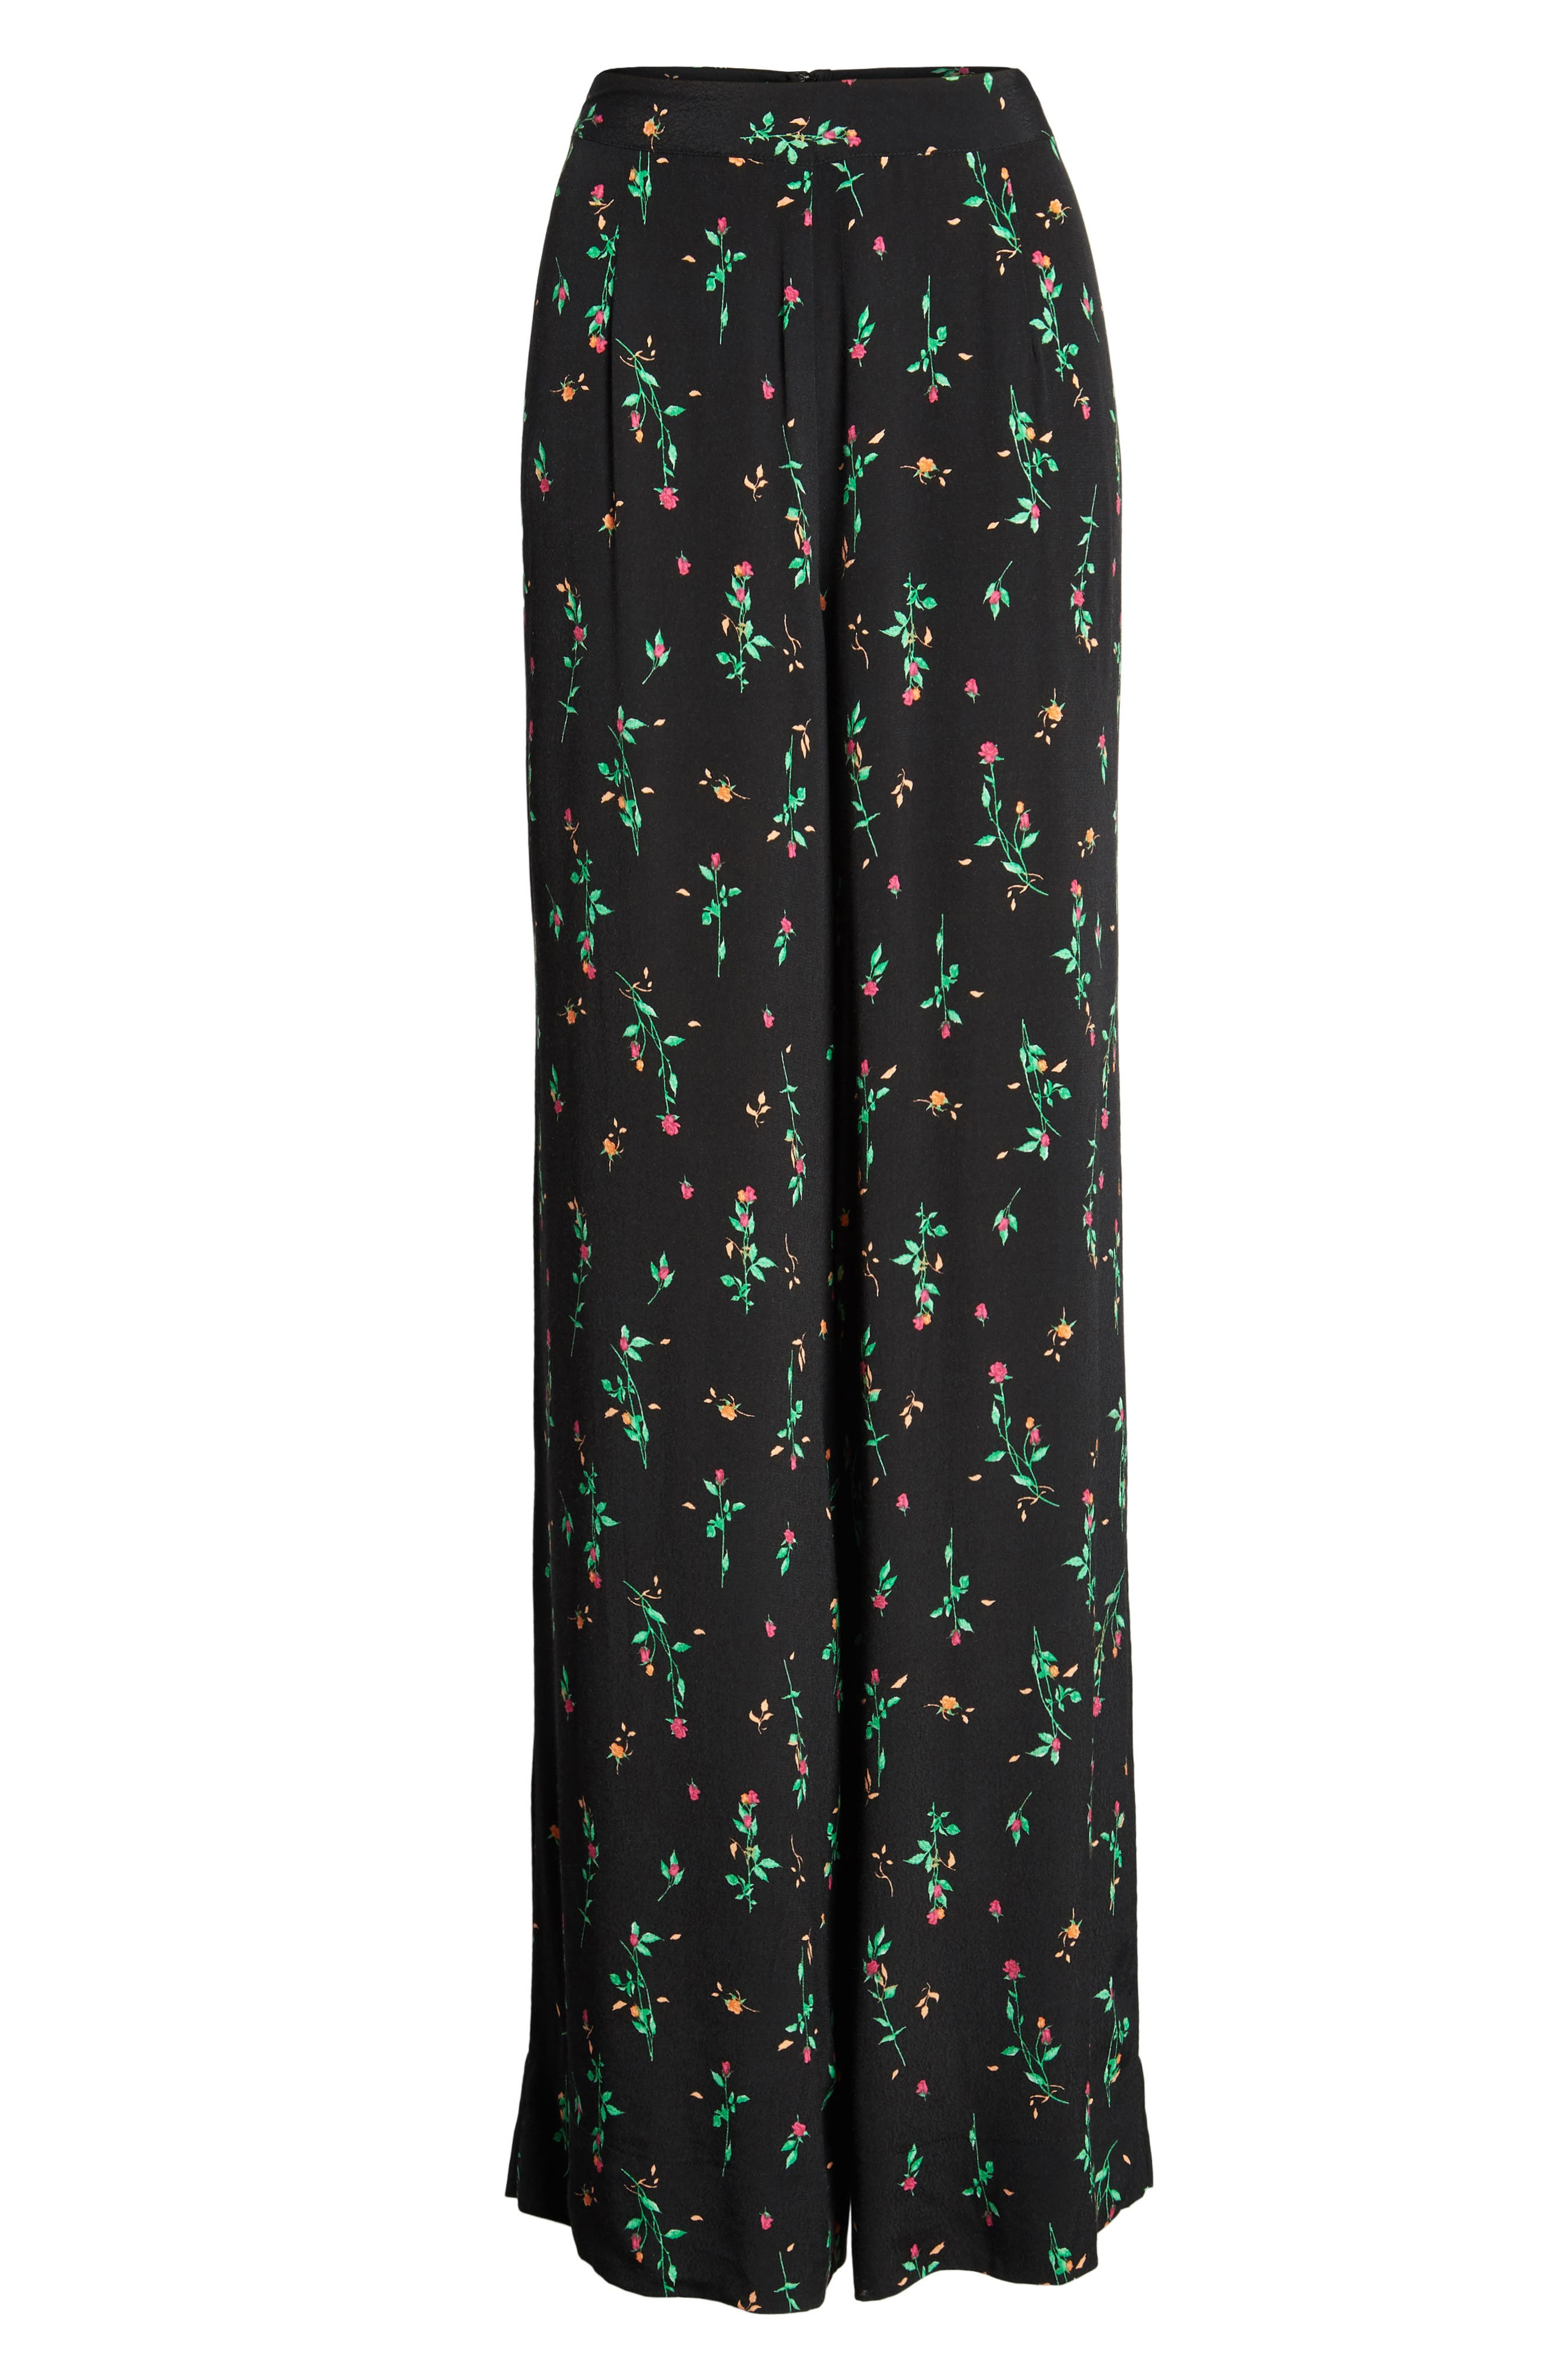 Carter High Waist Wide Leg Pants,                             Alternate thumbnail 6, color,                             001